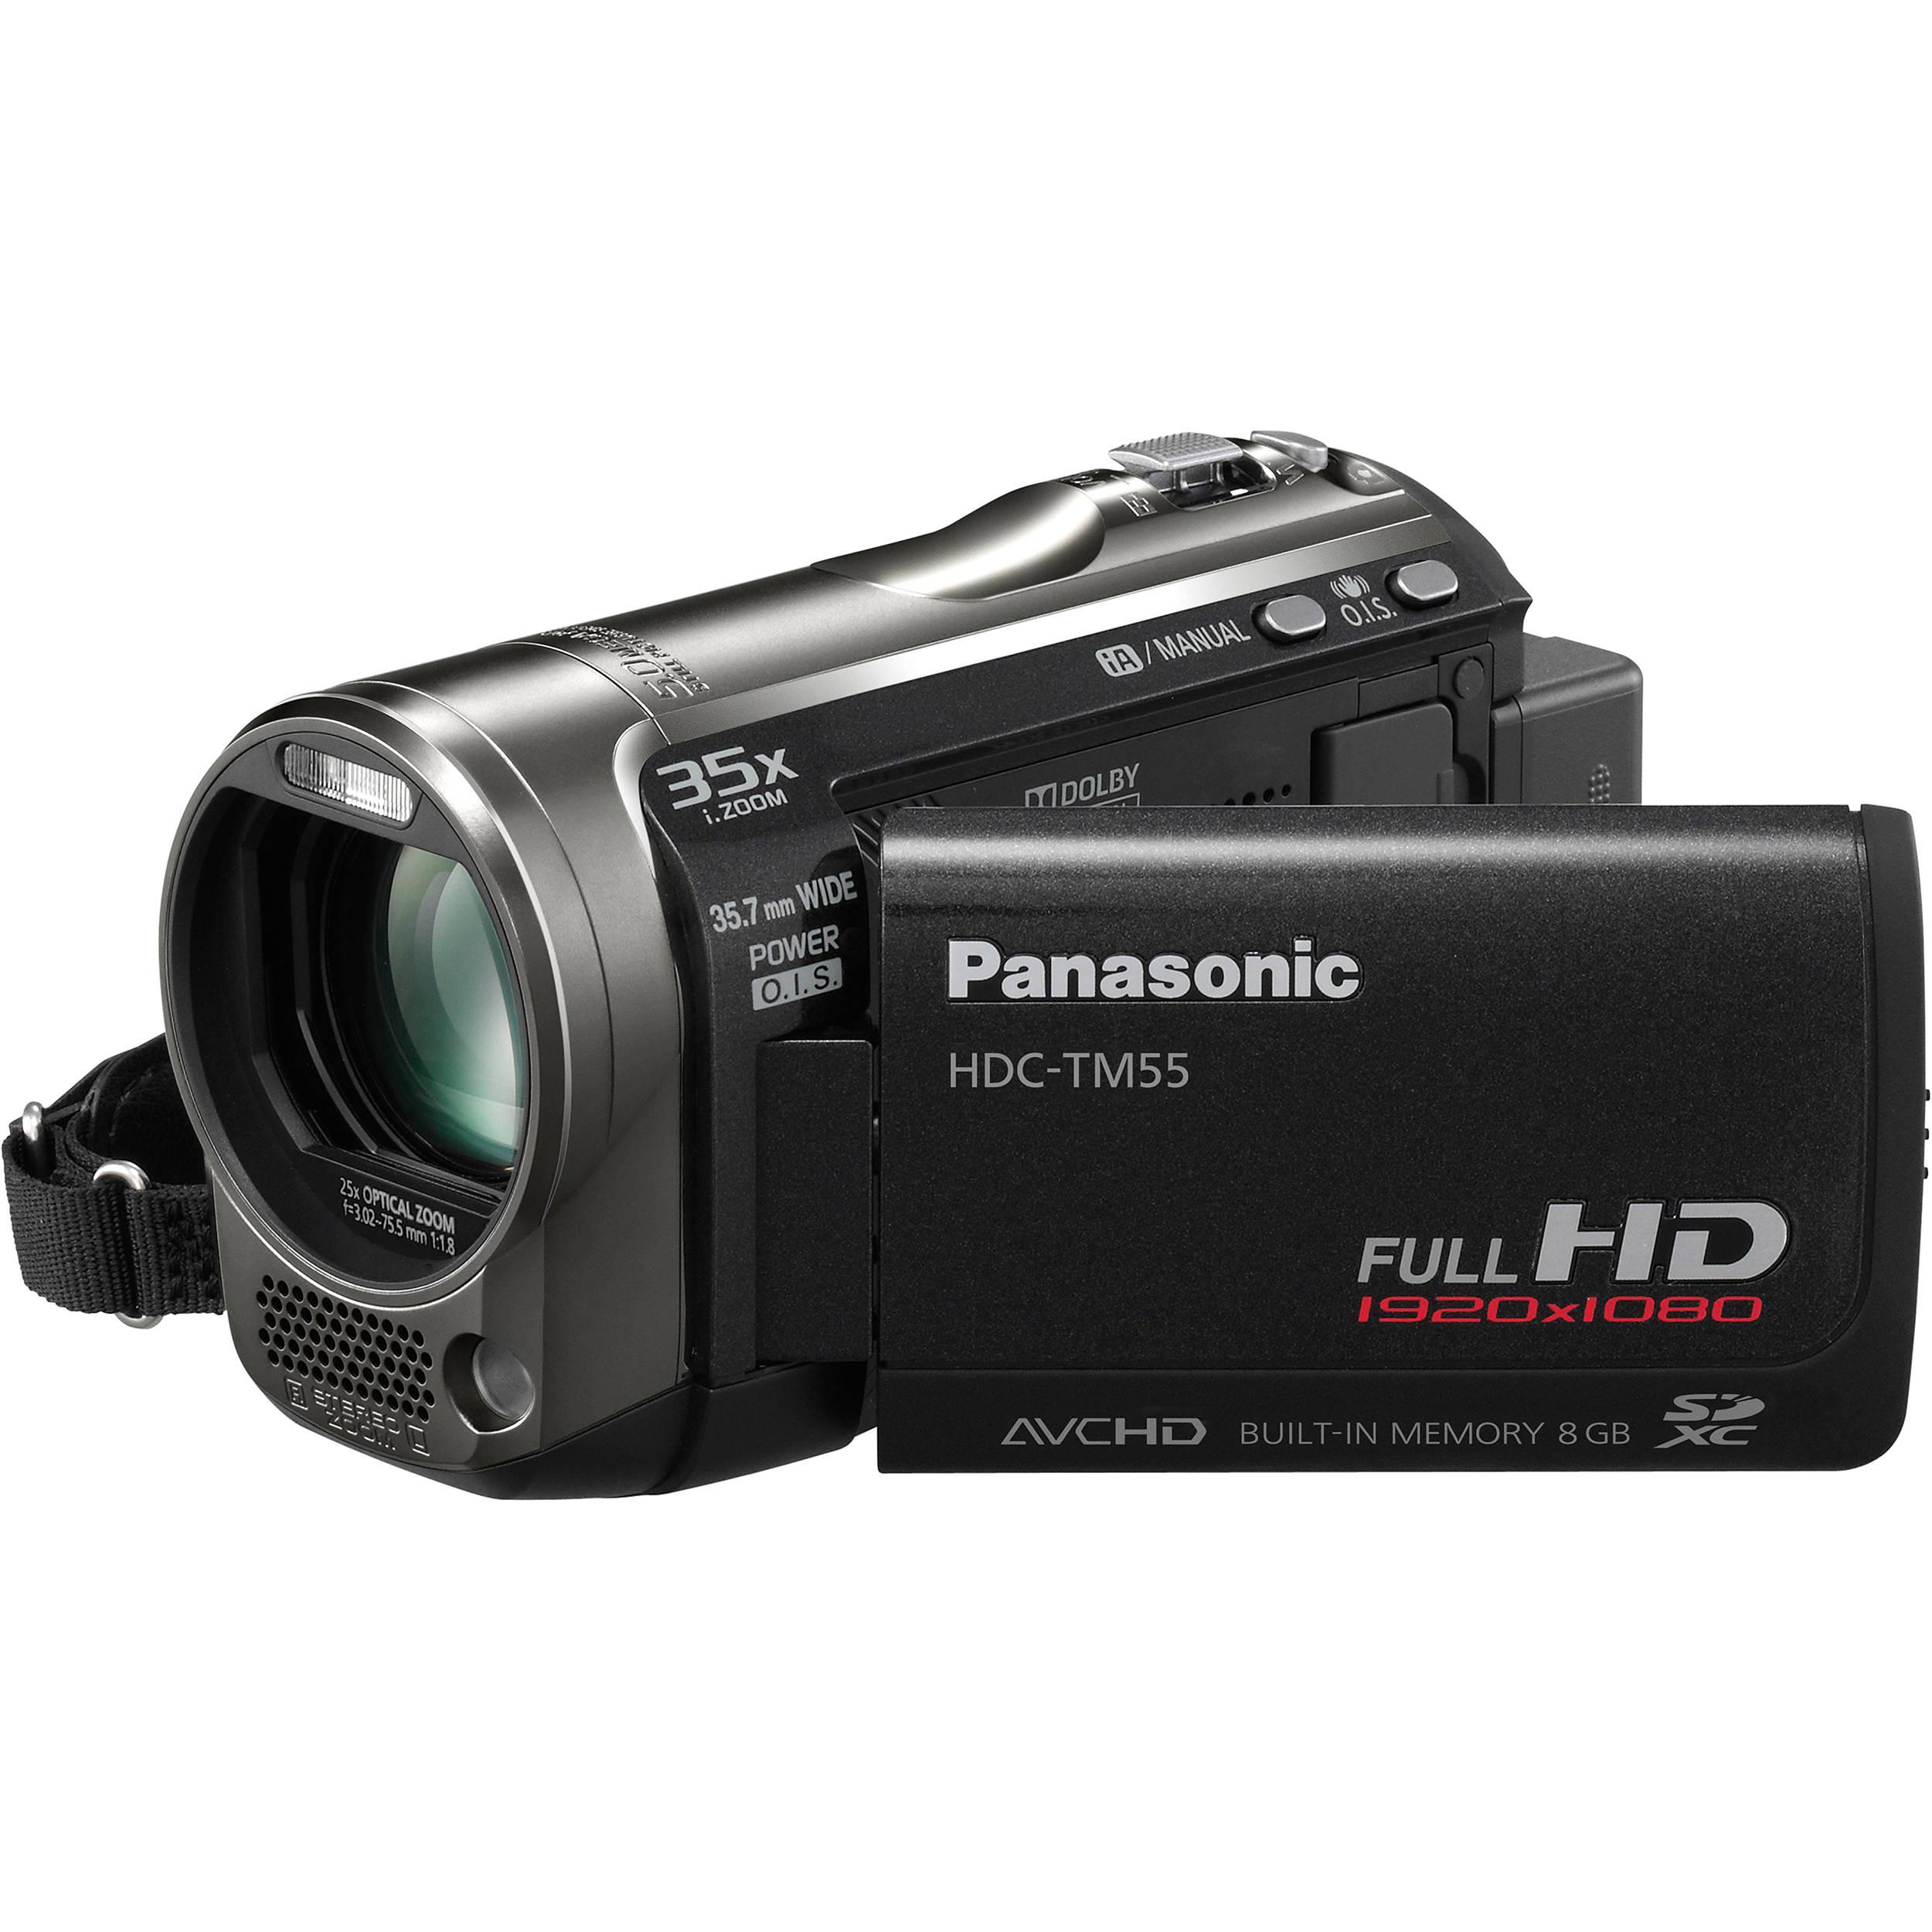 panasonic hdc tm55k high definition camcorder hdc tm55k b h rh bhphotovideo com Panasonic.comsupportbycncompass Panasonic Cordless Phones